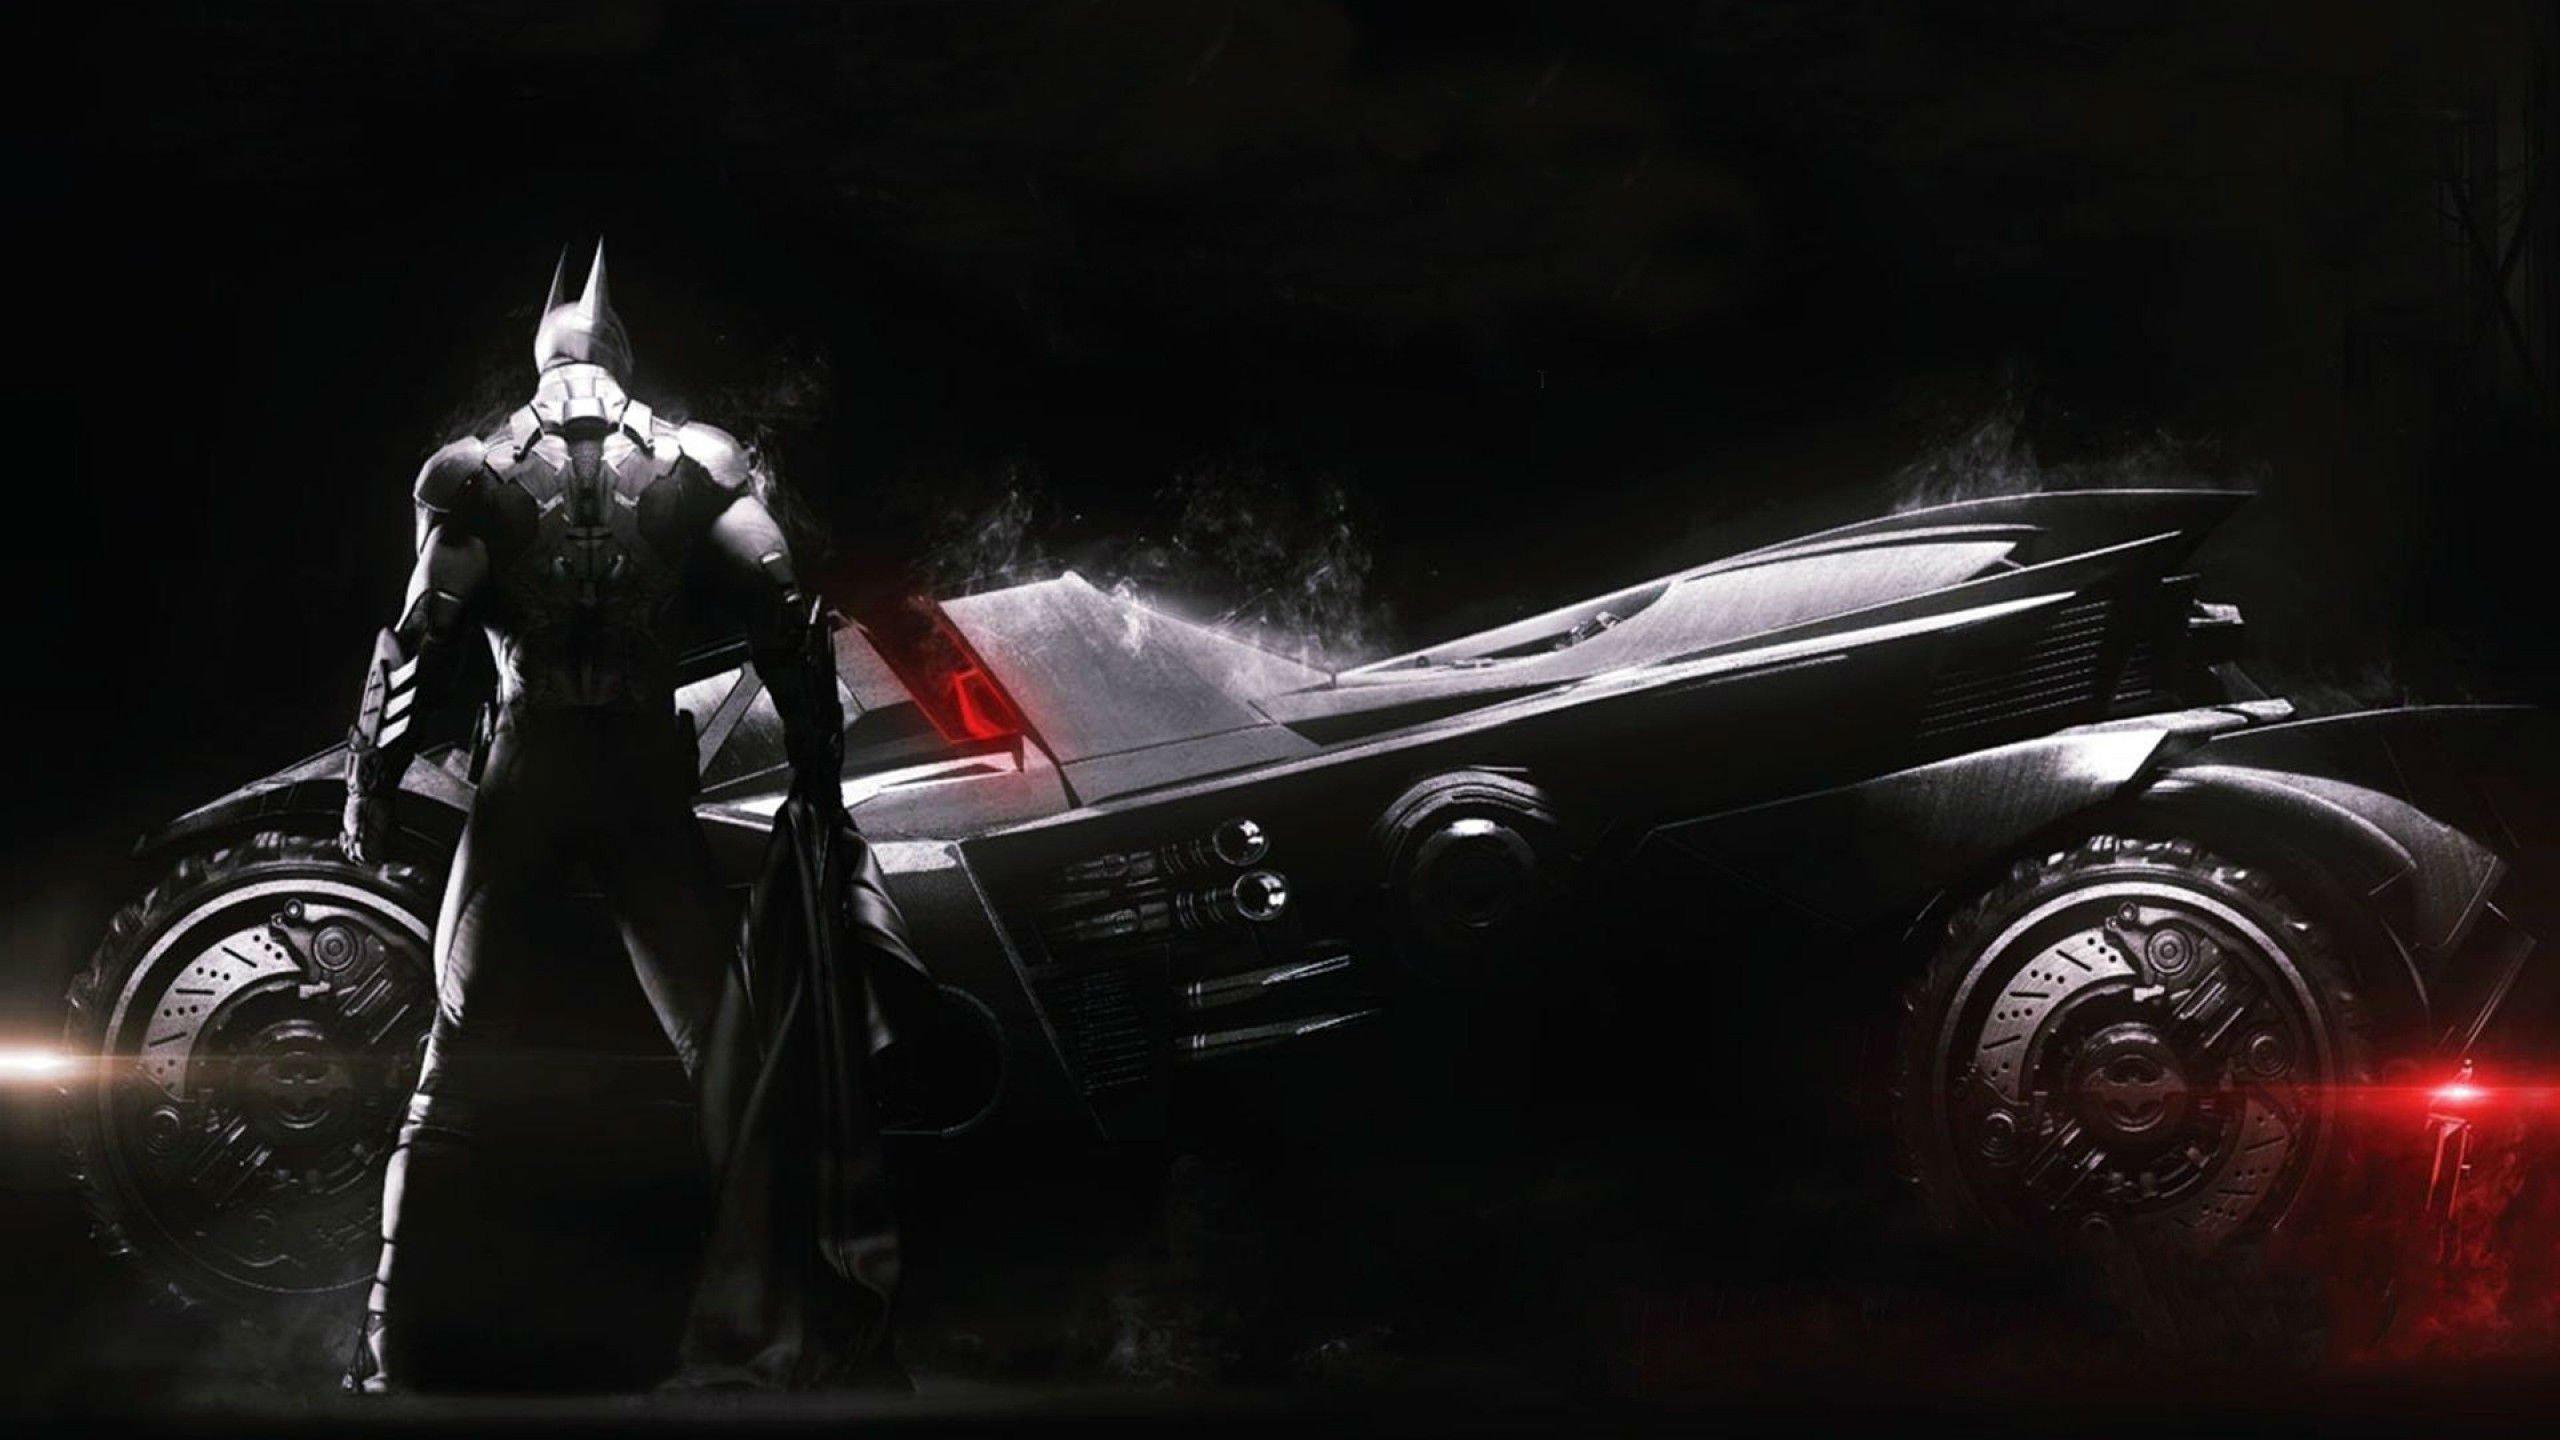 Batman The Dark Knight Car Wallpaper Batman Arkham Knight Action Adventure Superhero Comic Dark